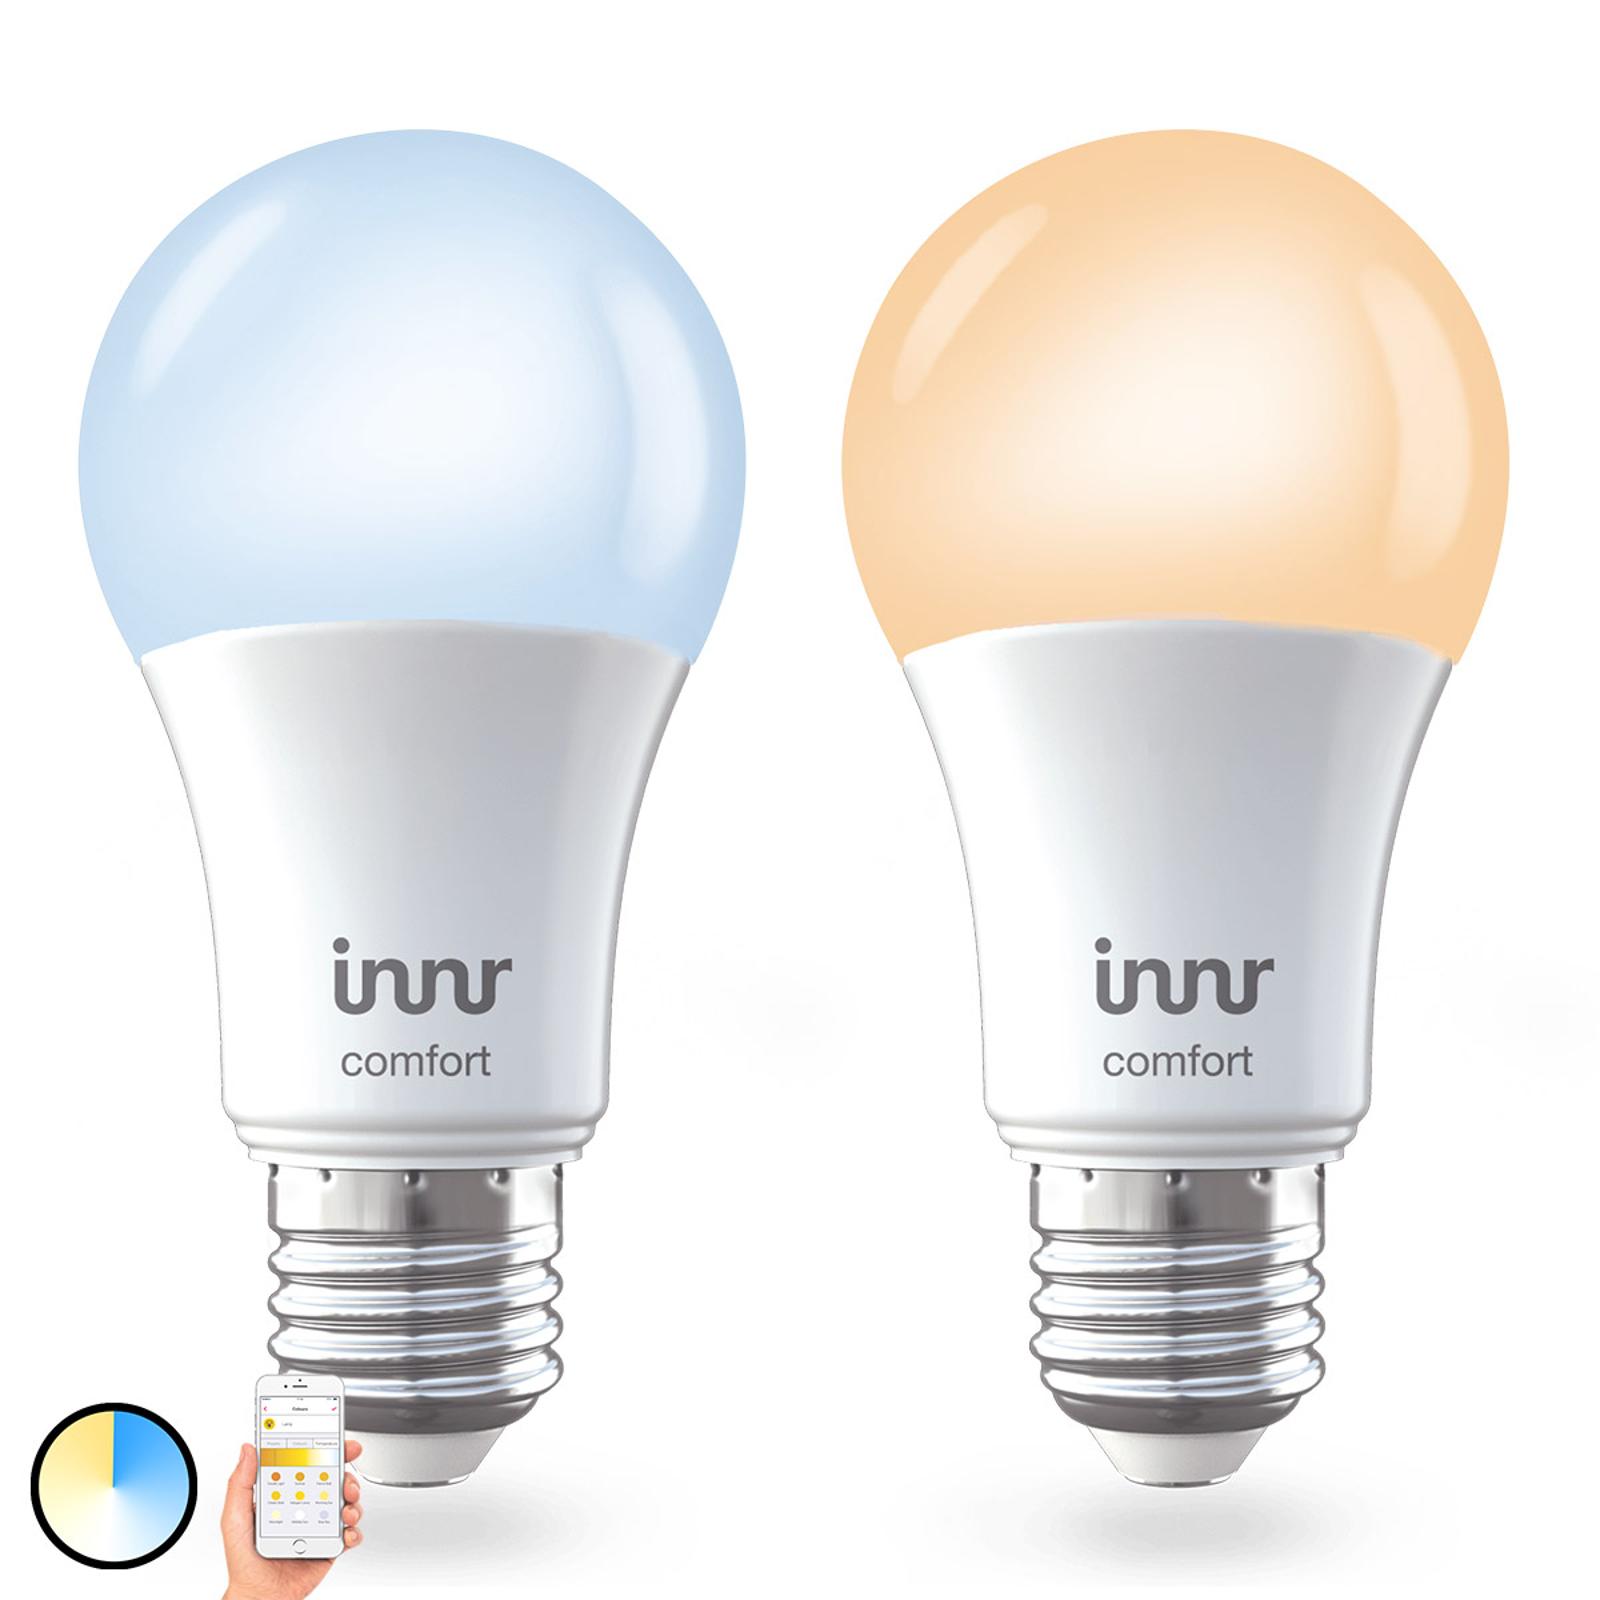 2 ampoules LED E27 9W Innr Smart Bulb Comfort